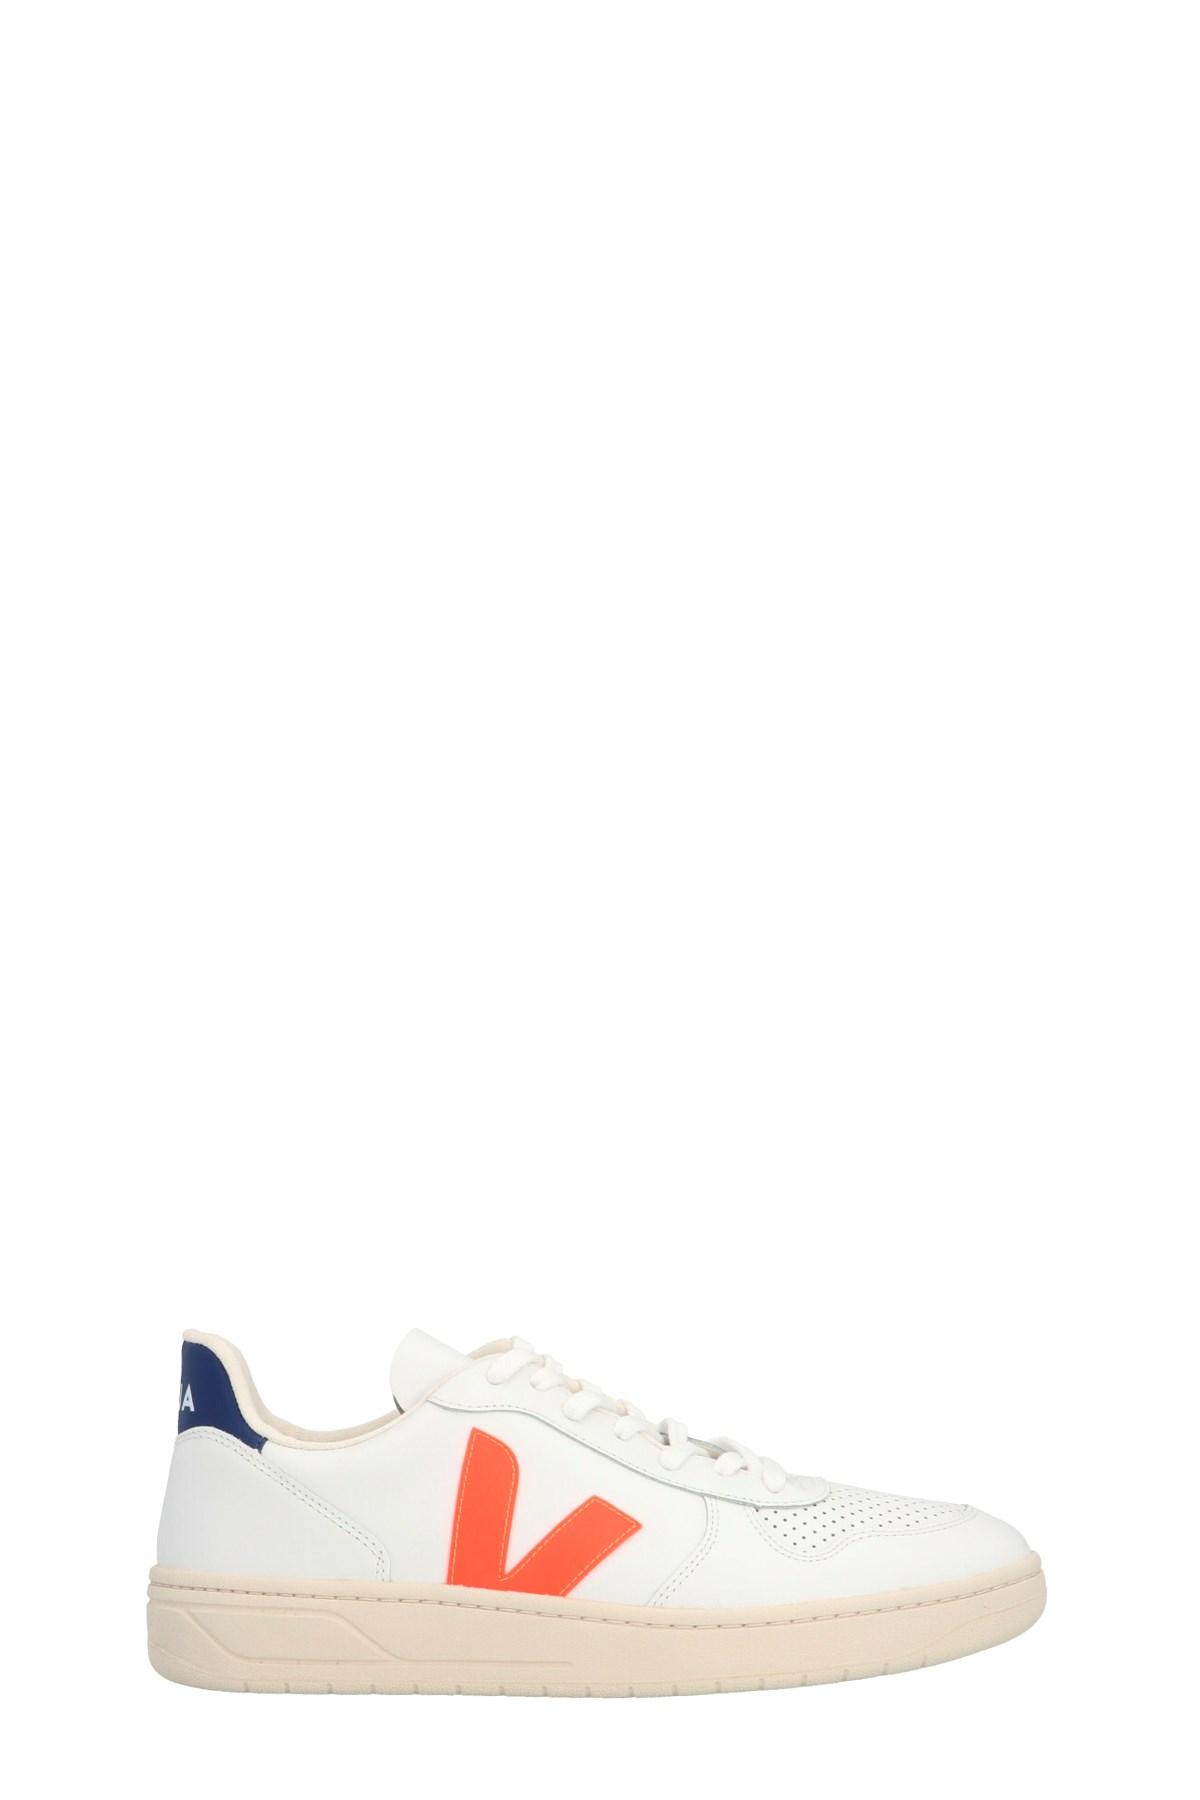 julian-fashion.com - 120928 - NL